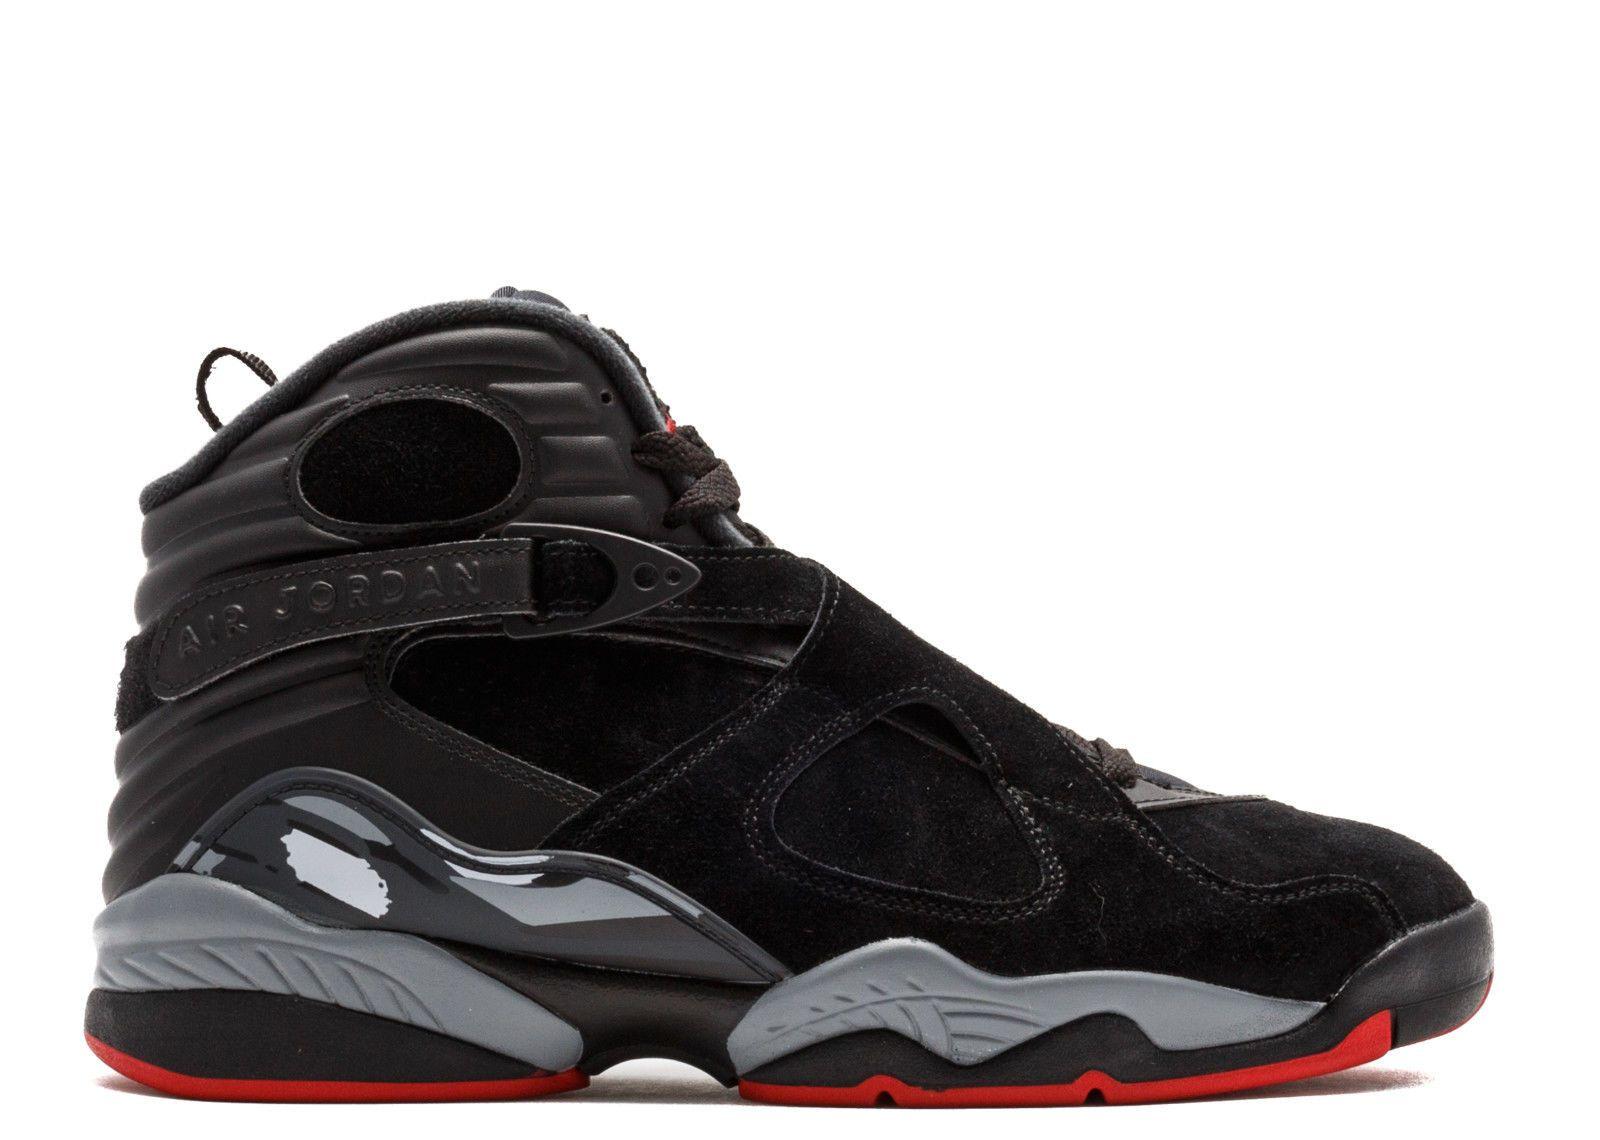 76a32200dc86 Nike Air Jordan 8 VIII Retro BRED Black Red 305381-022 Black Cement Size 8